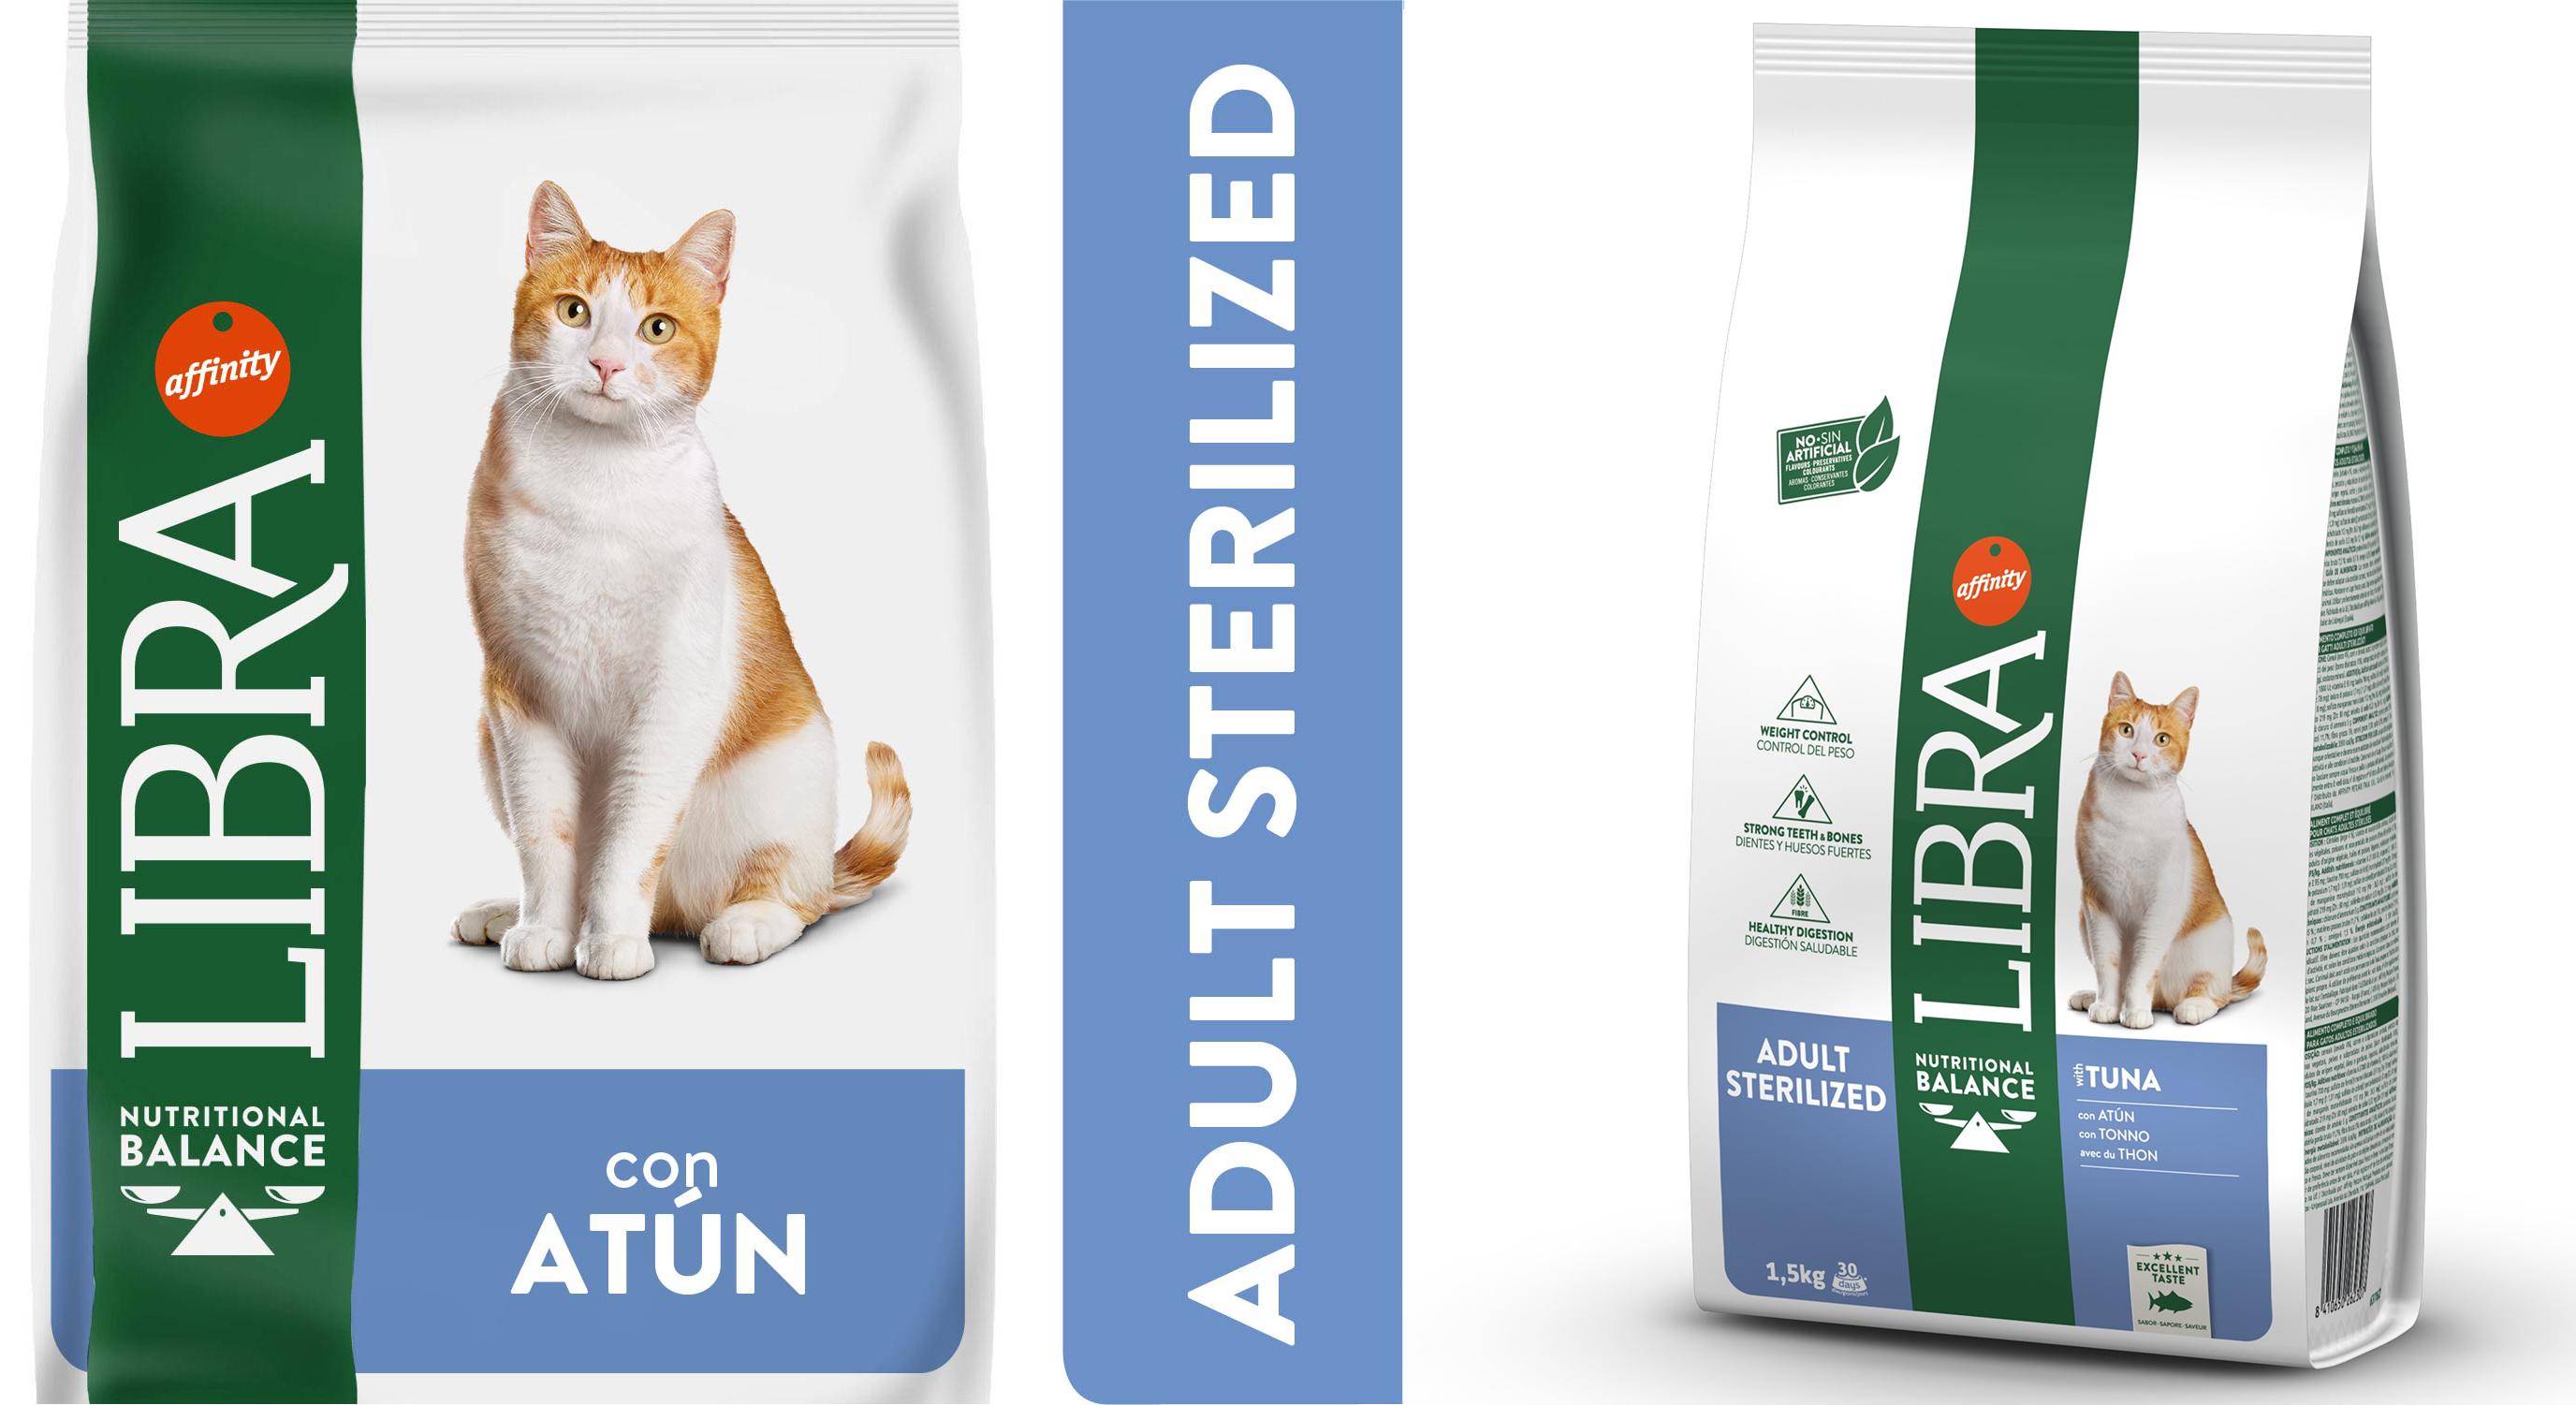 Libra de Affinity | Gato Adult sterilized